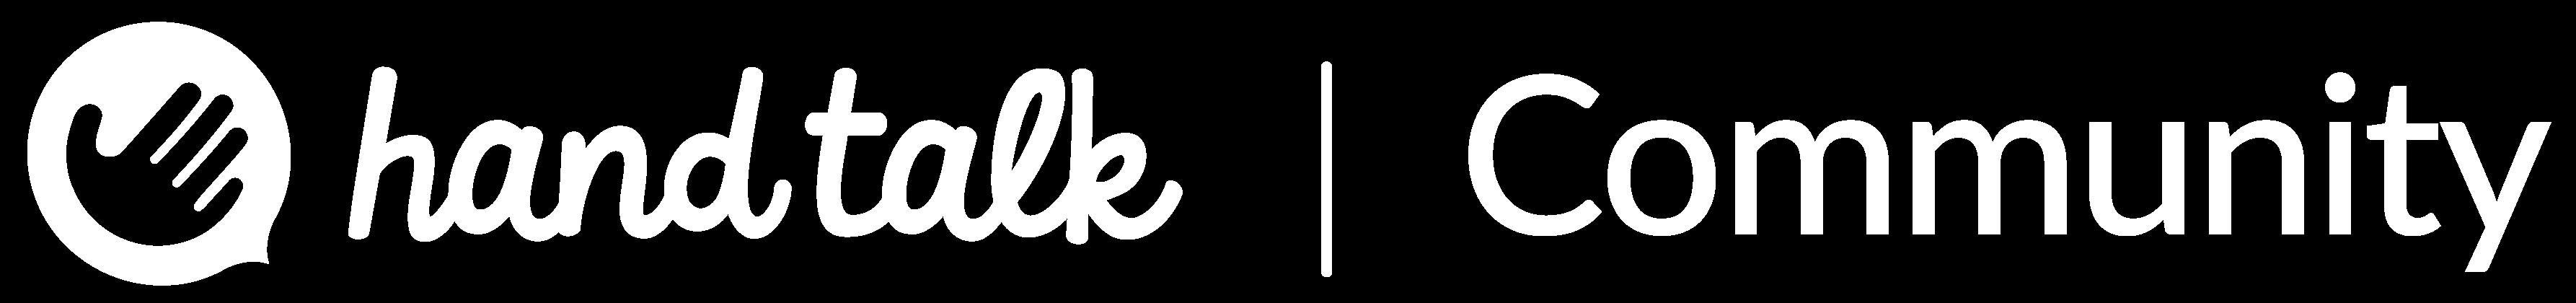 Logo da Hand Talk e ao seu lado direito o texto